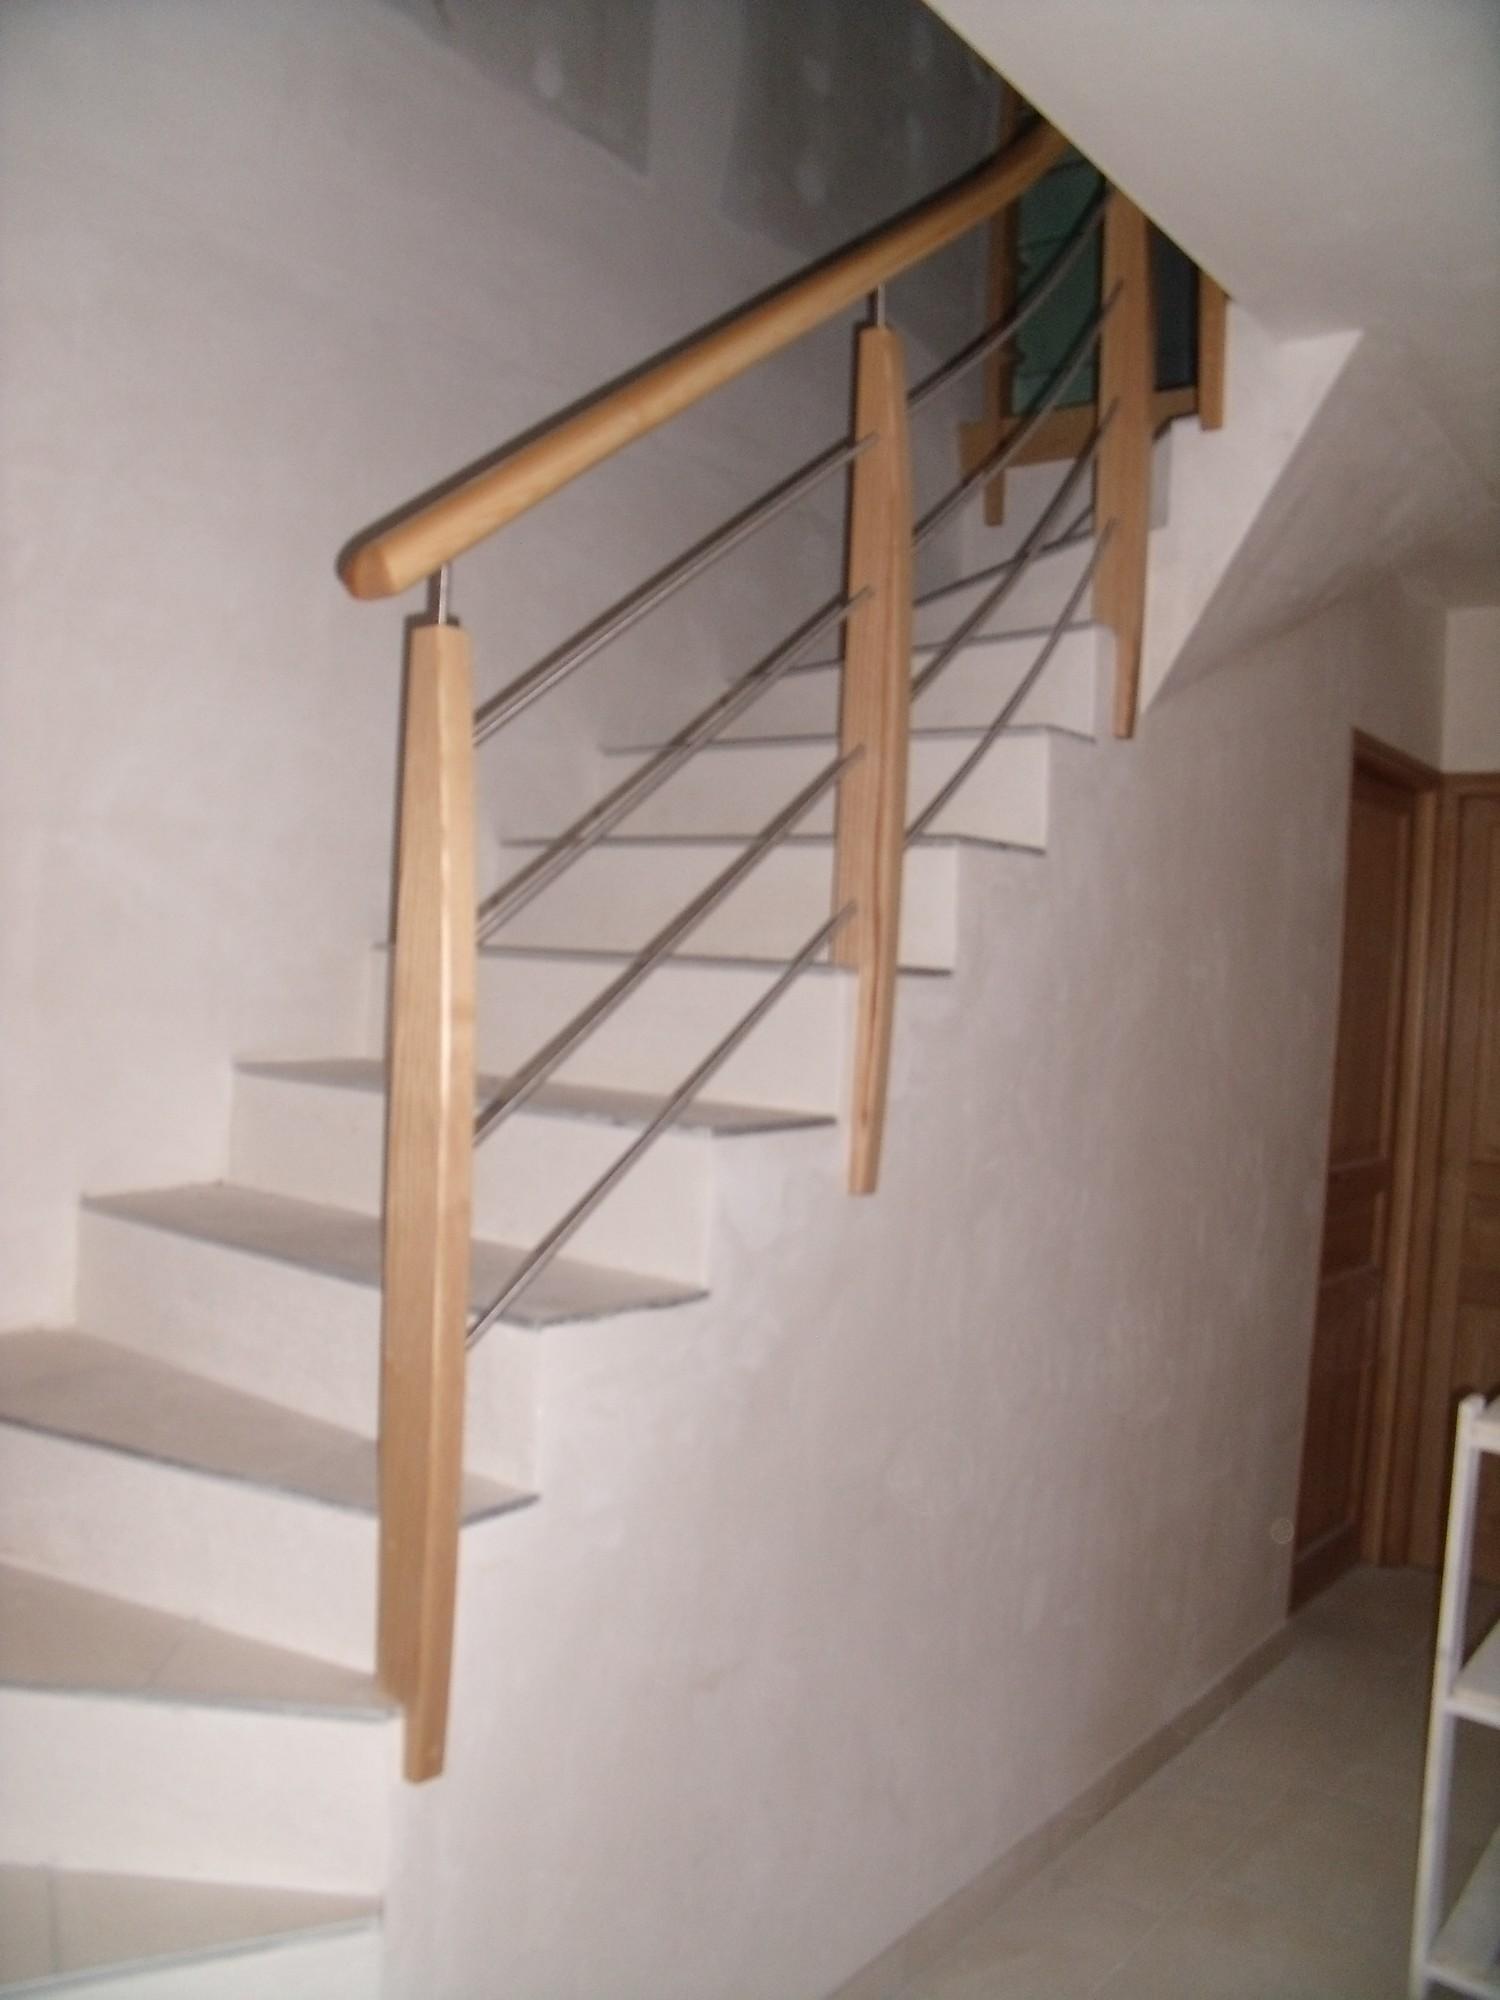 Rampe sur escalier carrel atelier glotin pontchateau - Rampe escalier bois ...